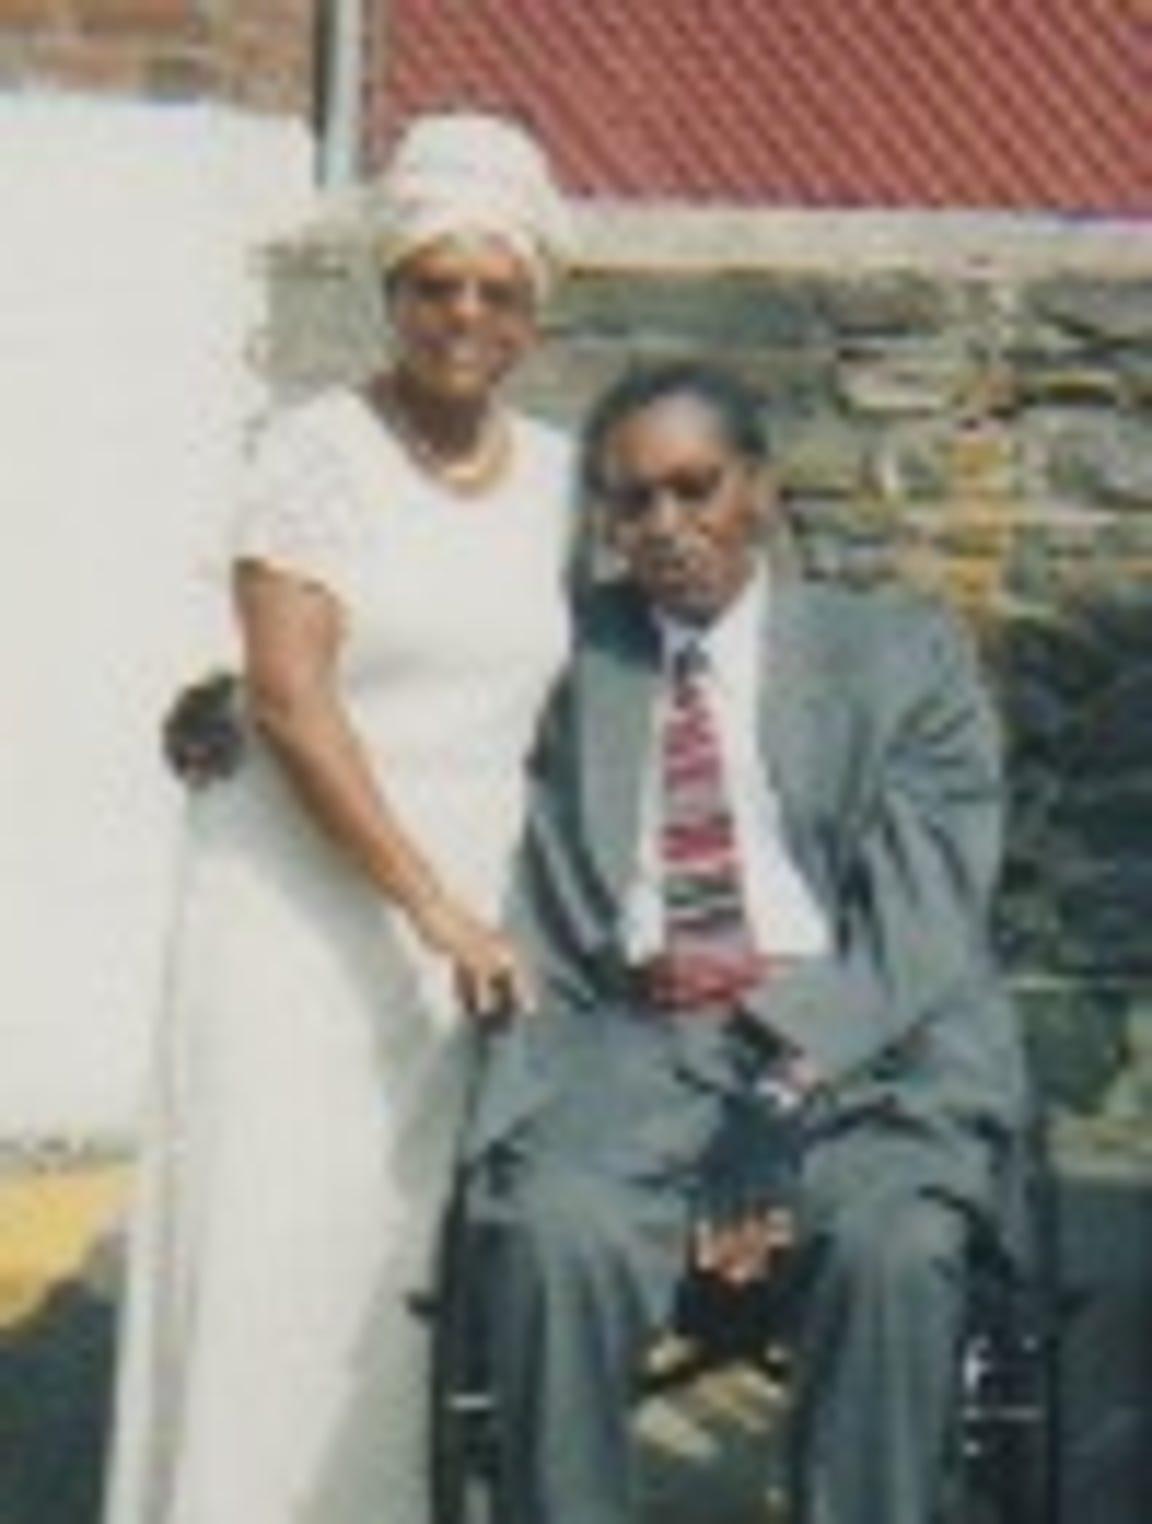 The Rev. Emma Loftin-Woods said her grandson was arrested